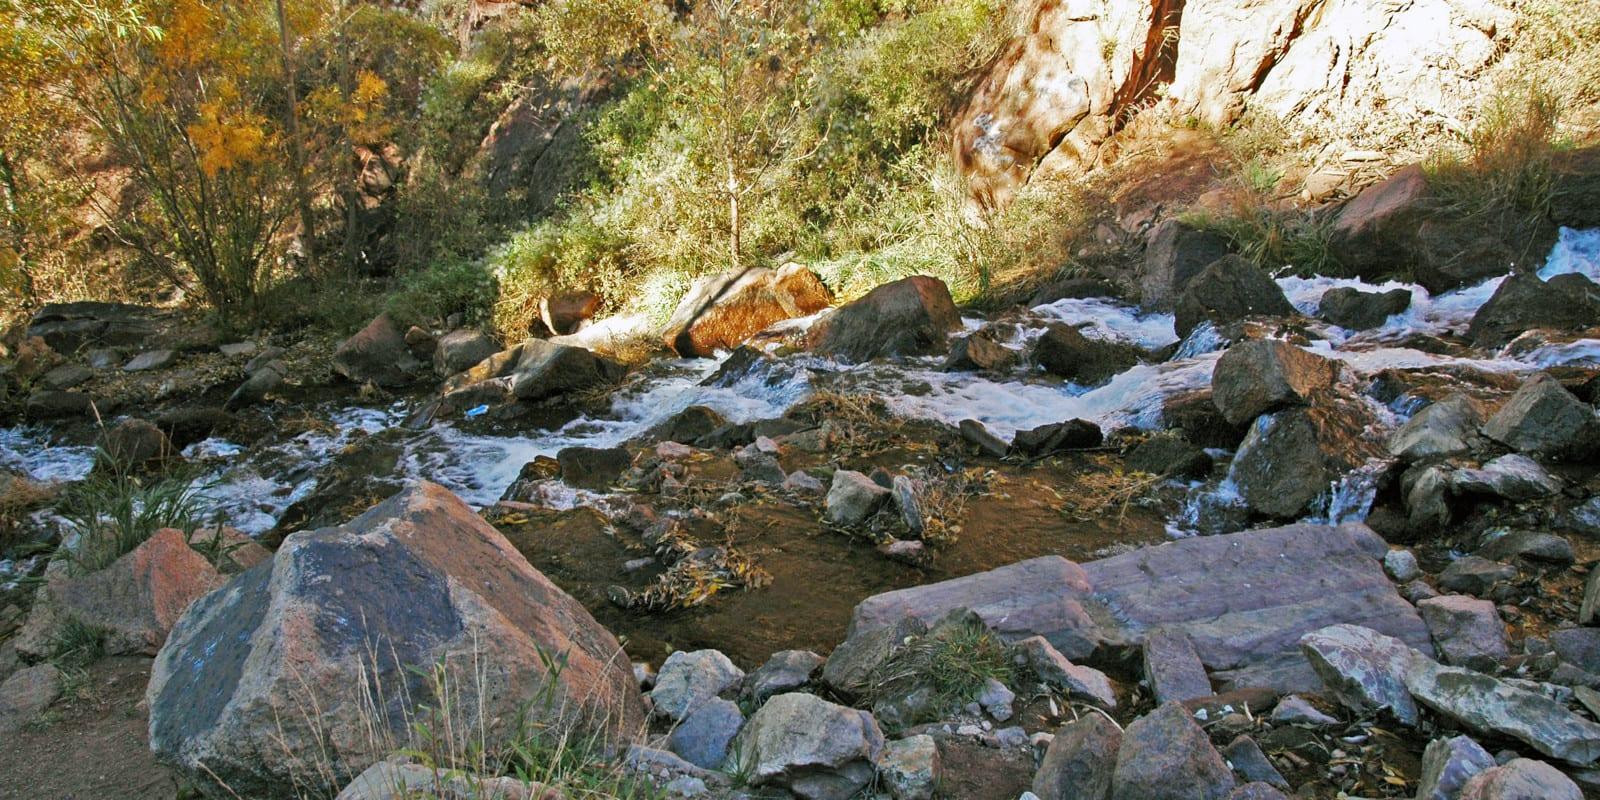 Image of Fountain Creek in Colorado